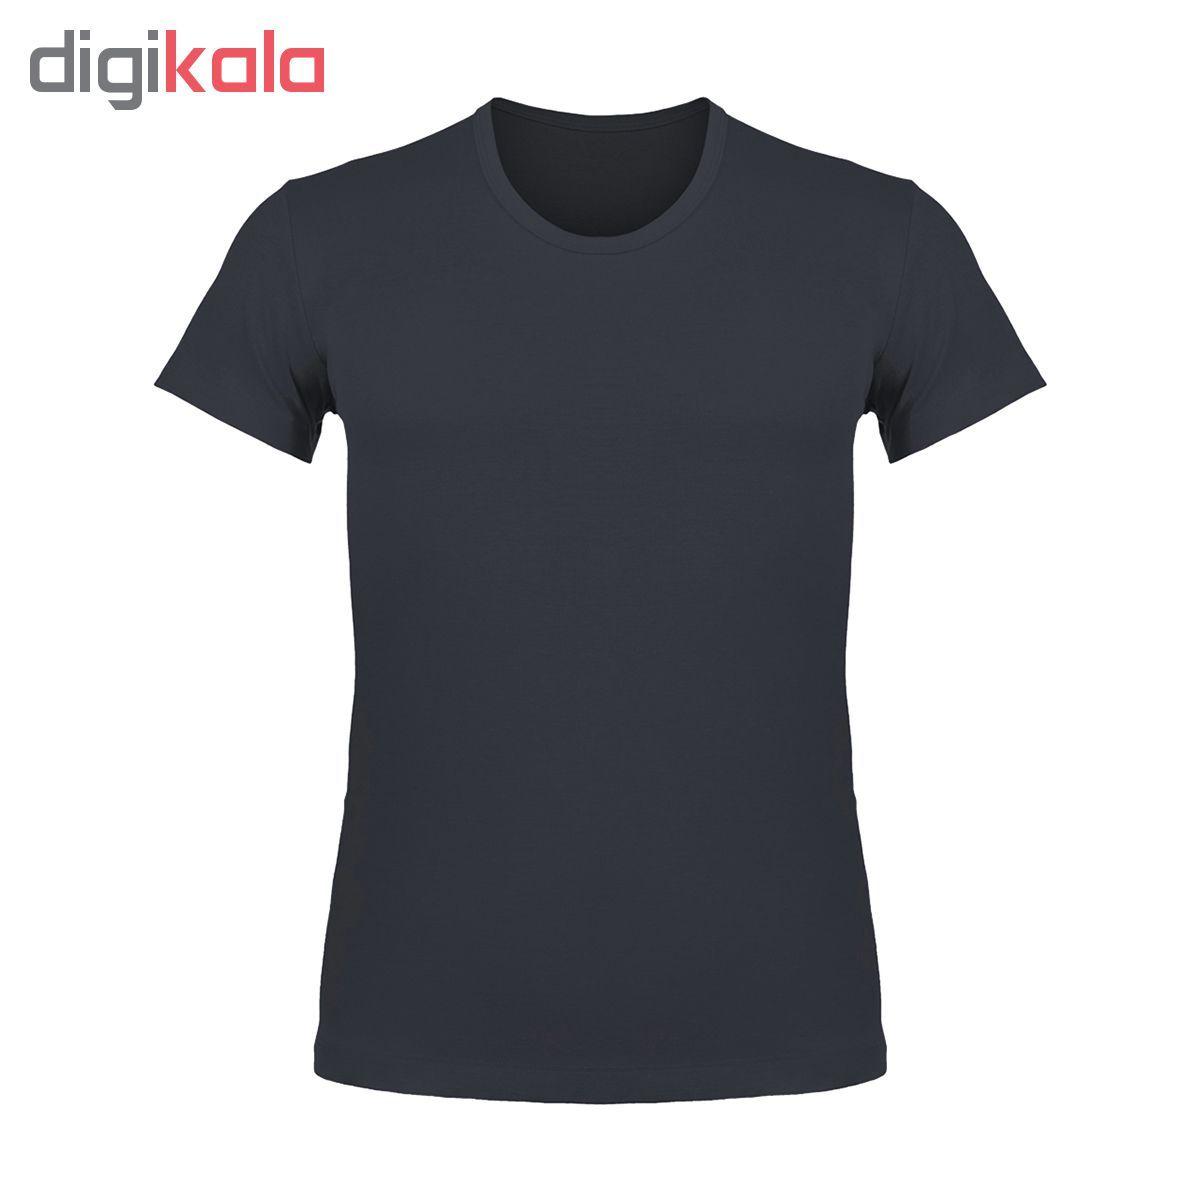 زیرپوش مردانه کیان تن پوش مدل U Neck Shirt Classic PE main 1 1